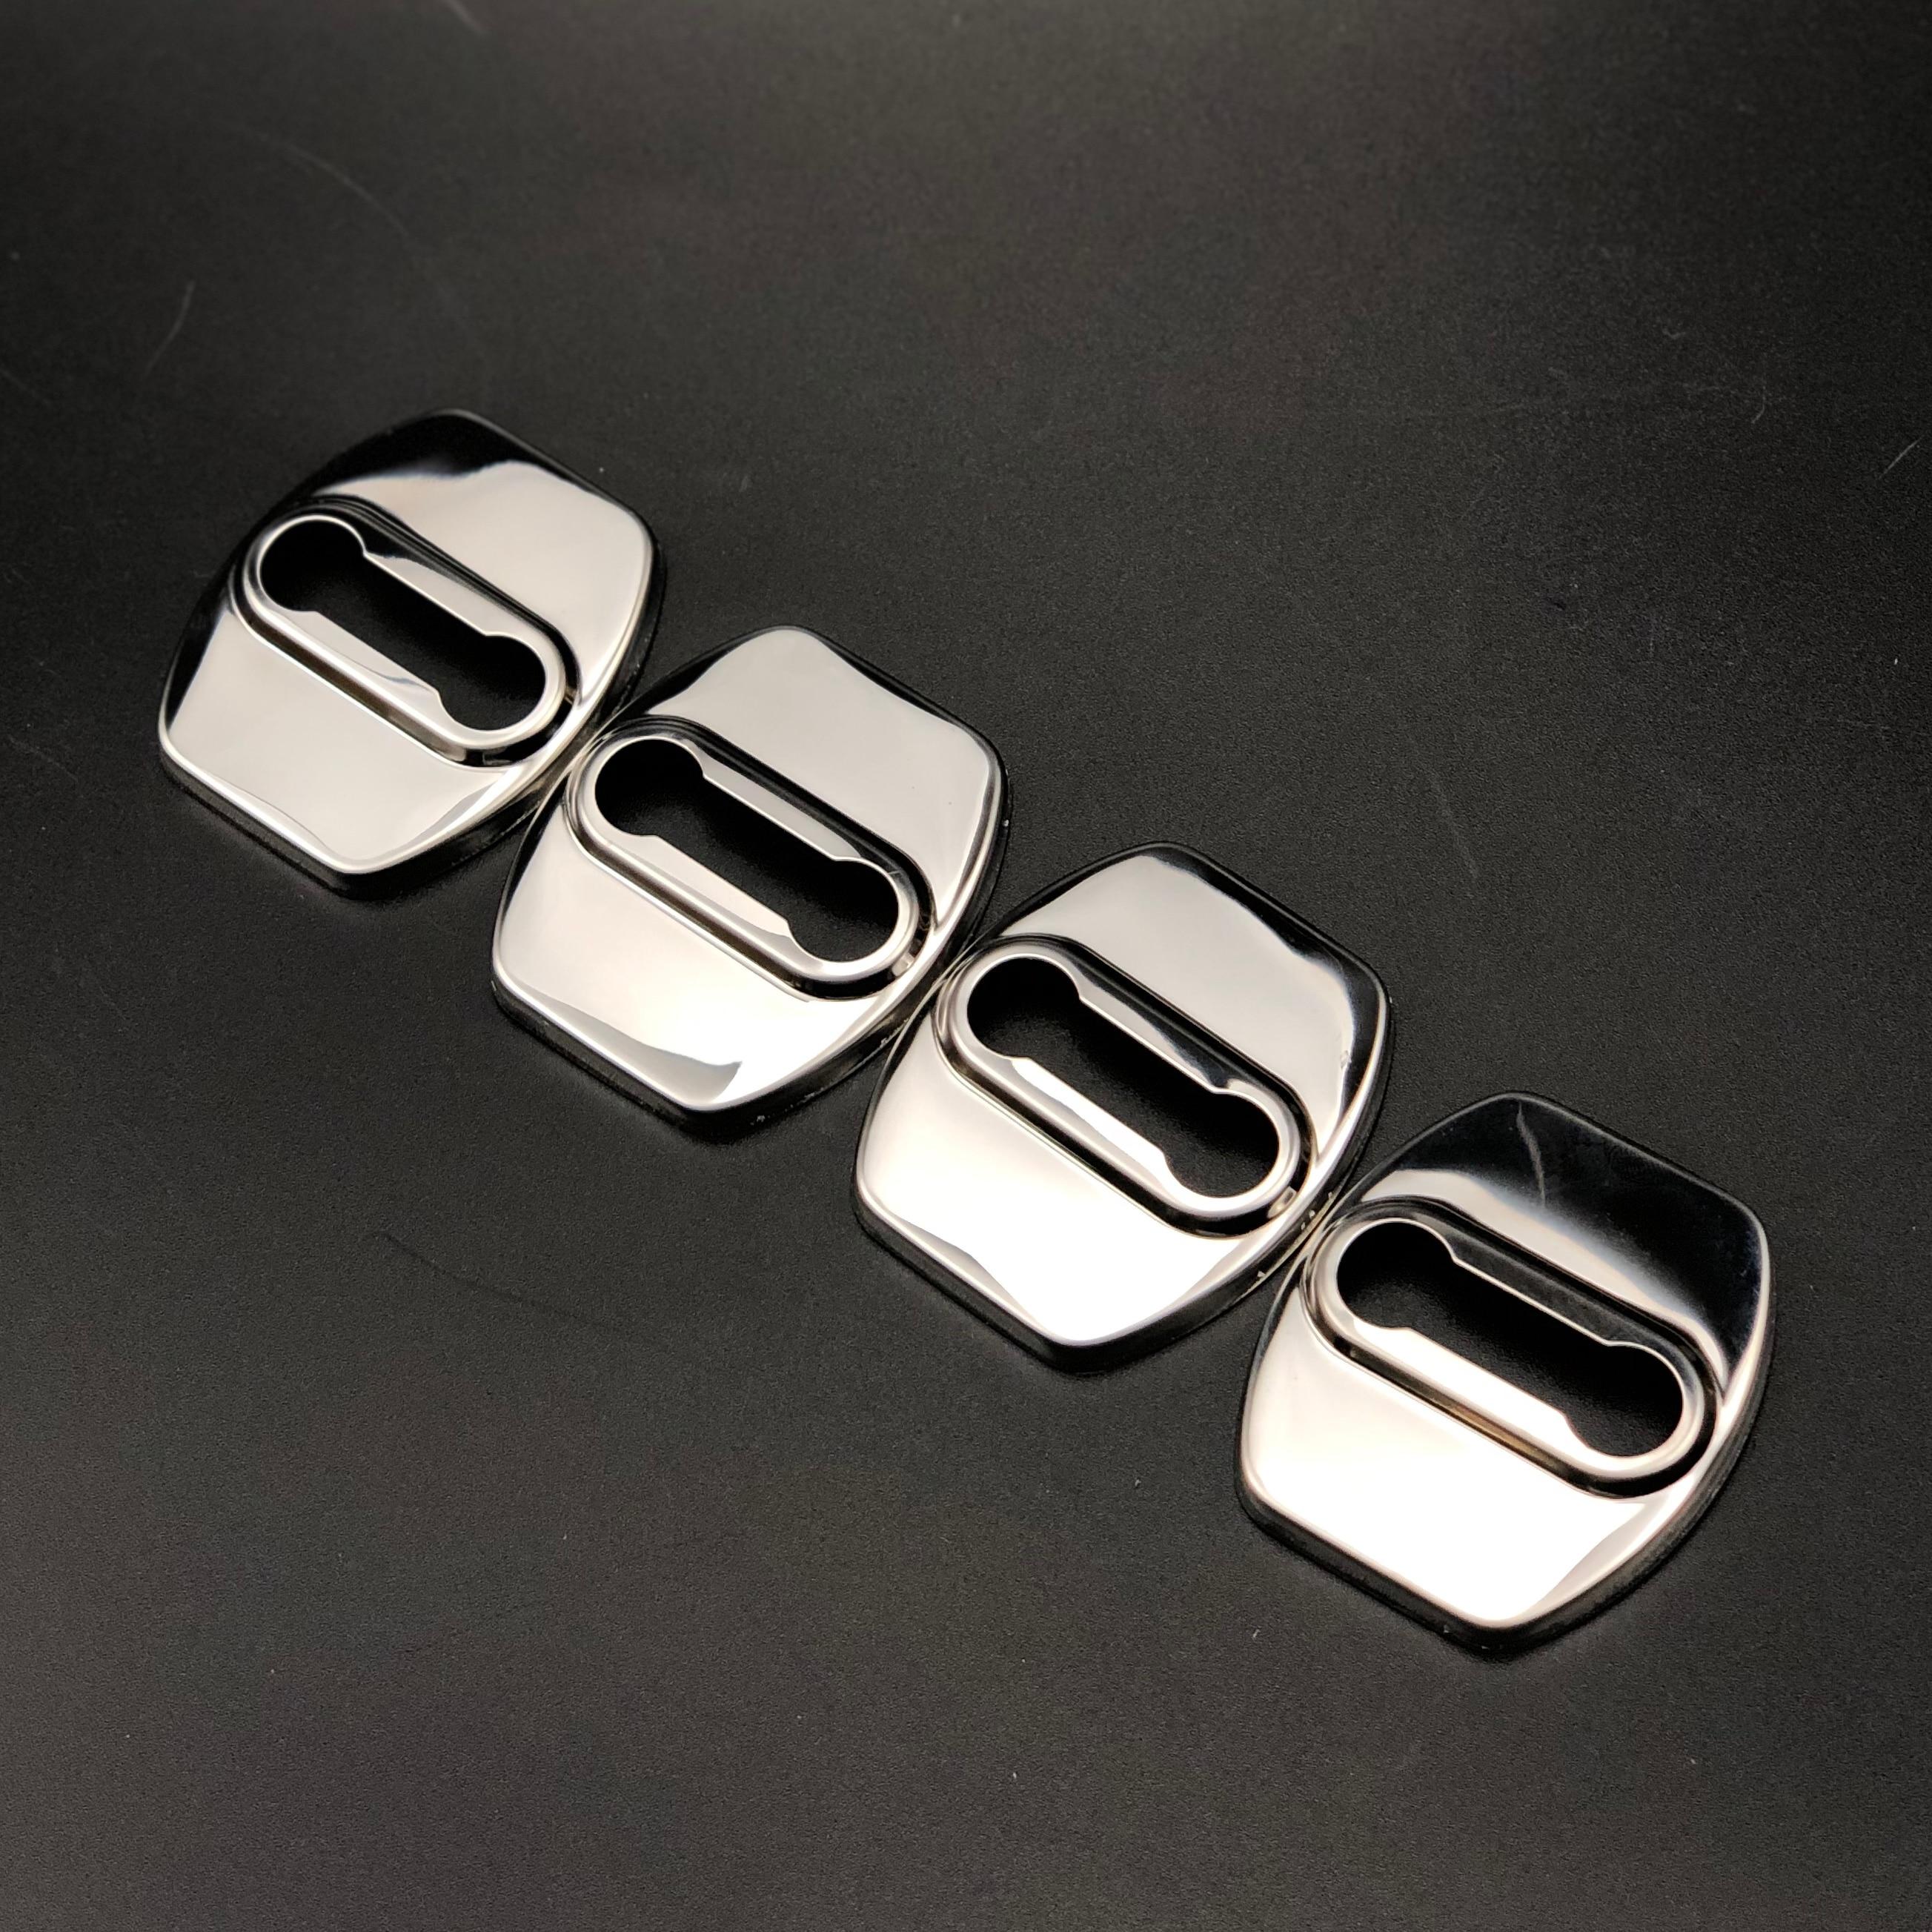 Car styling Accessories Door Lock Cover For Kia SORENTO Stinger Niro Carnival Ray Venga ProCeed Stonic SP Telluride